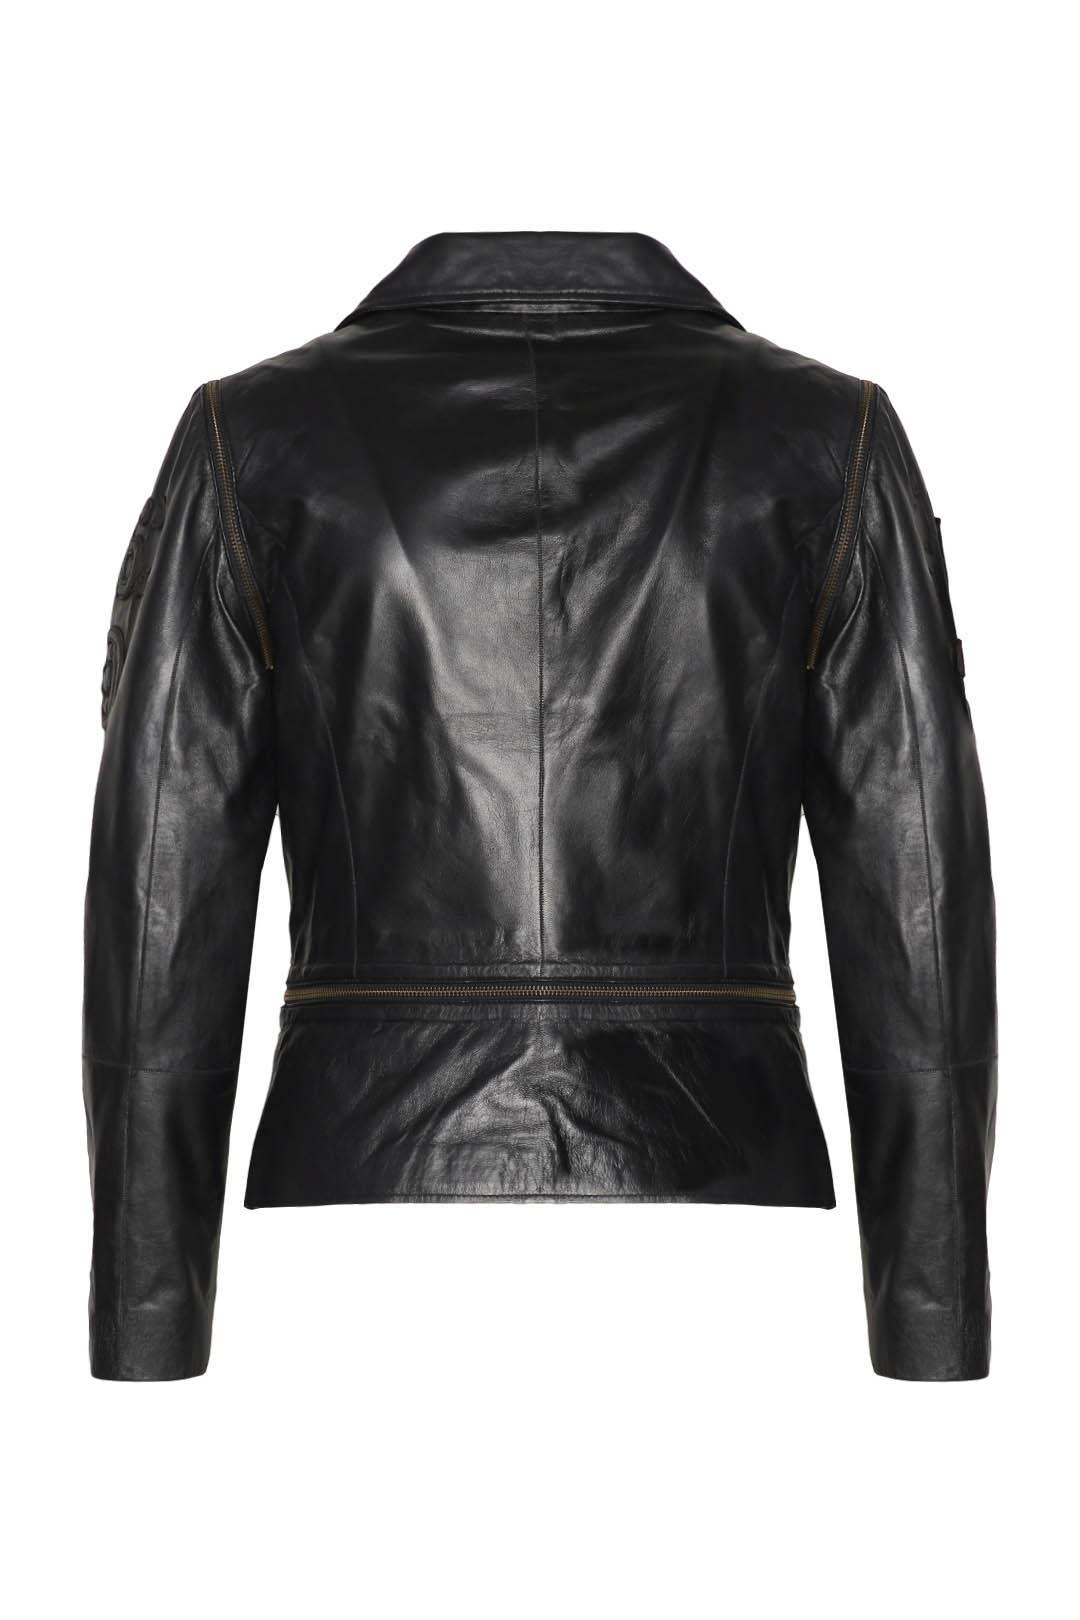 Soft Nappa leather jacket                        2